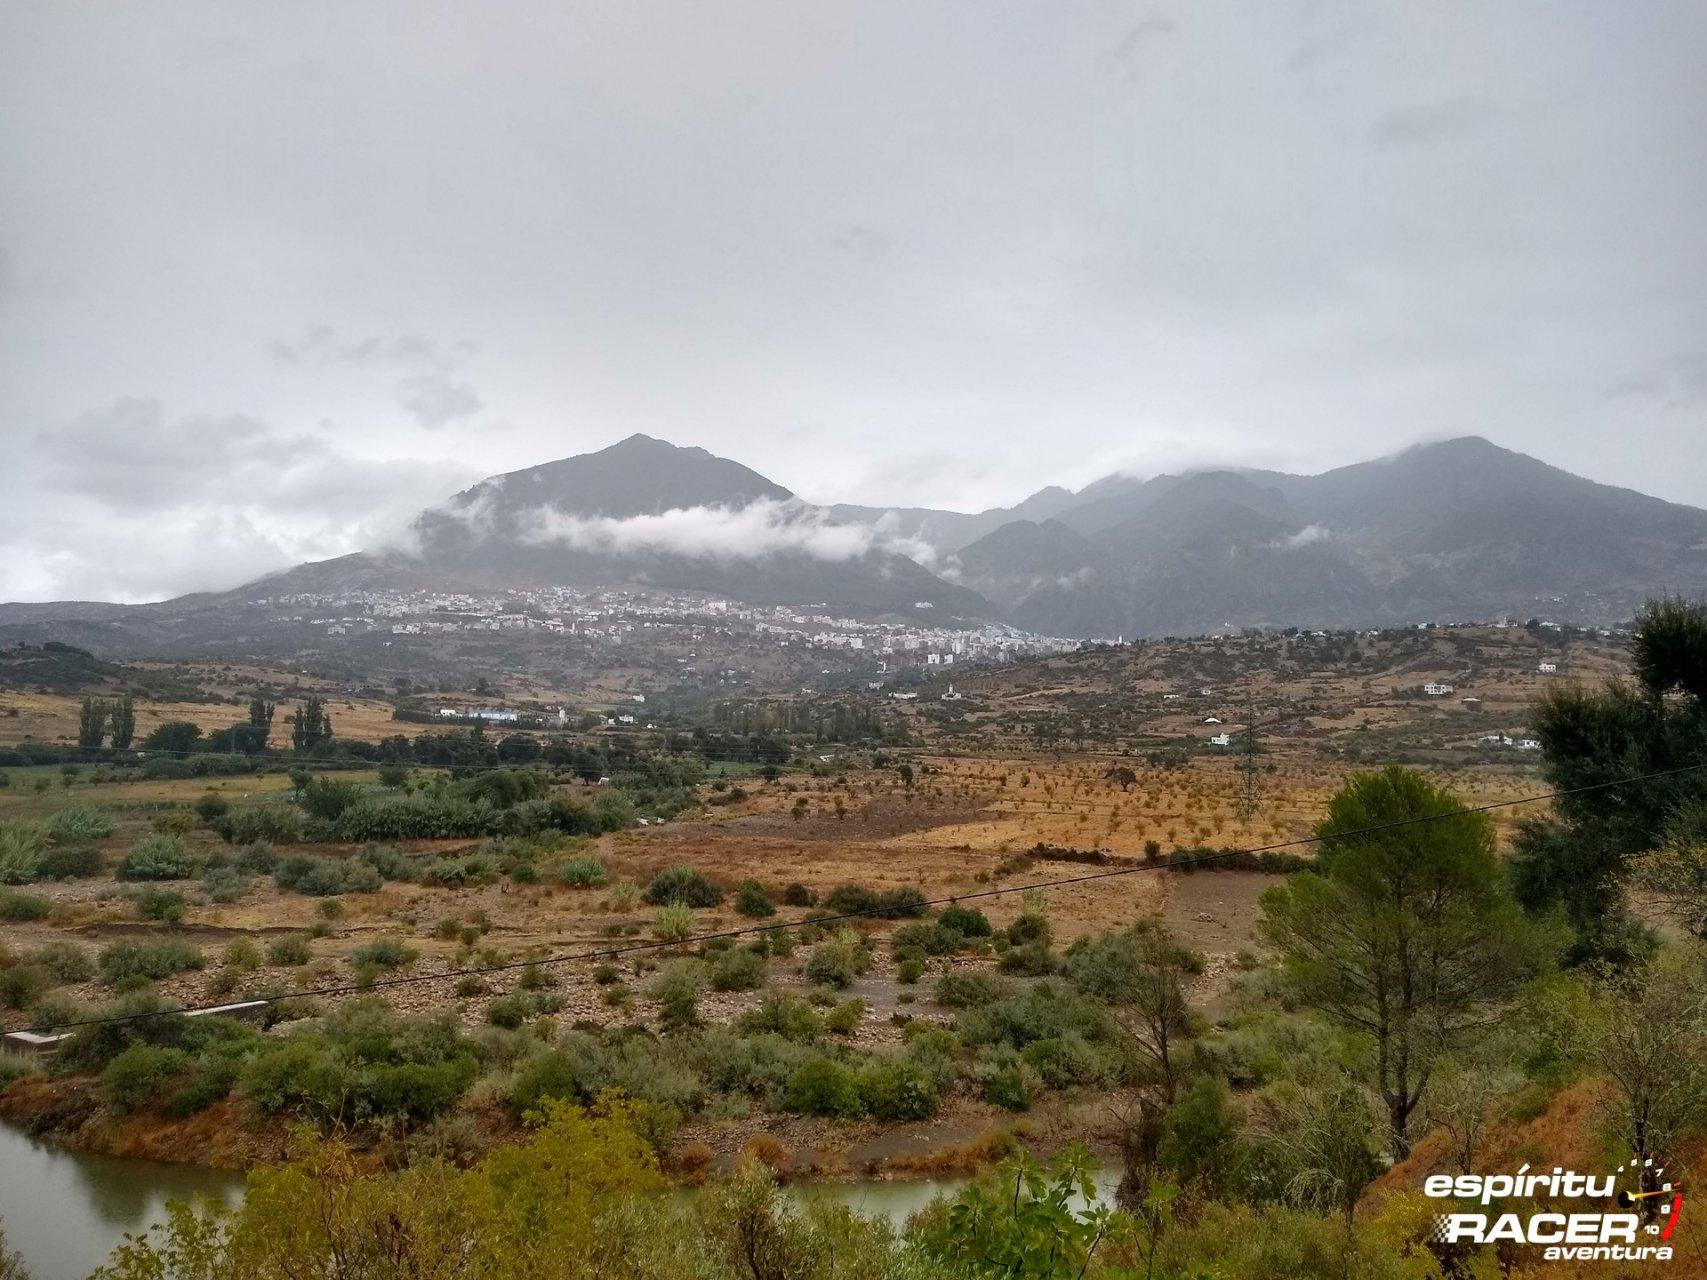 15 dias por Marruecos con Royal Enfield Himalayan 49